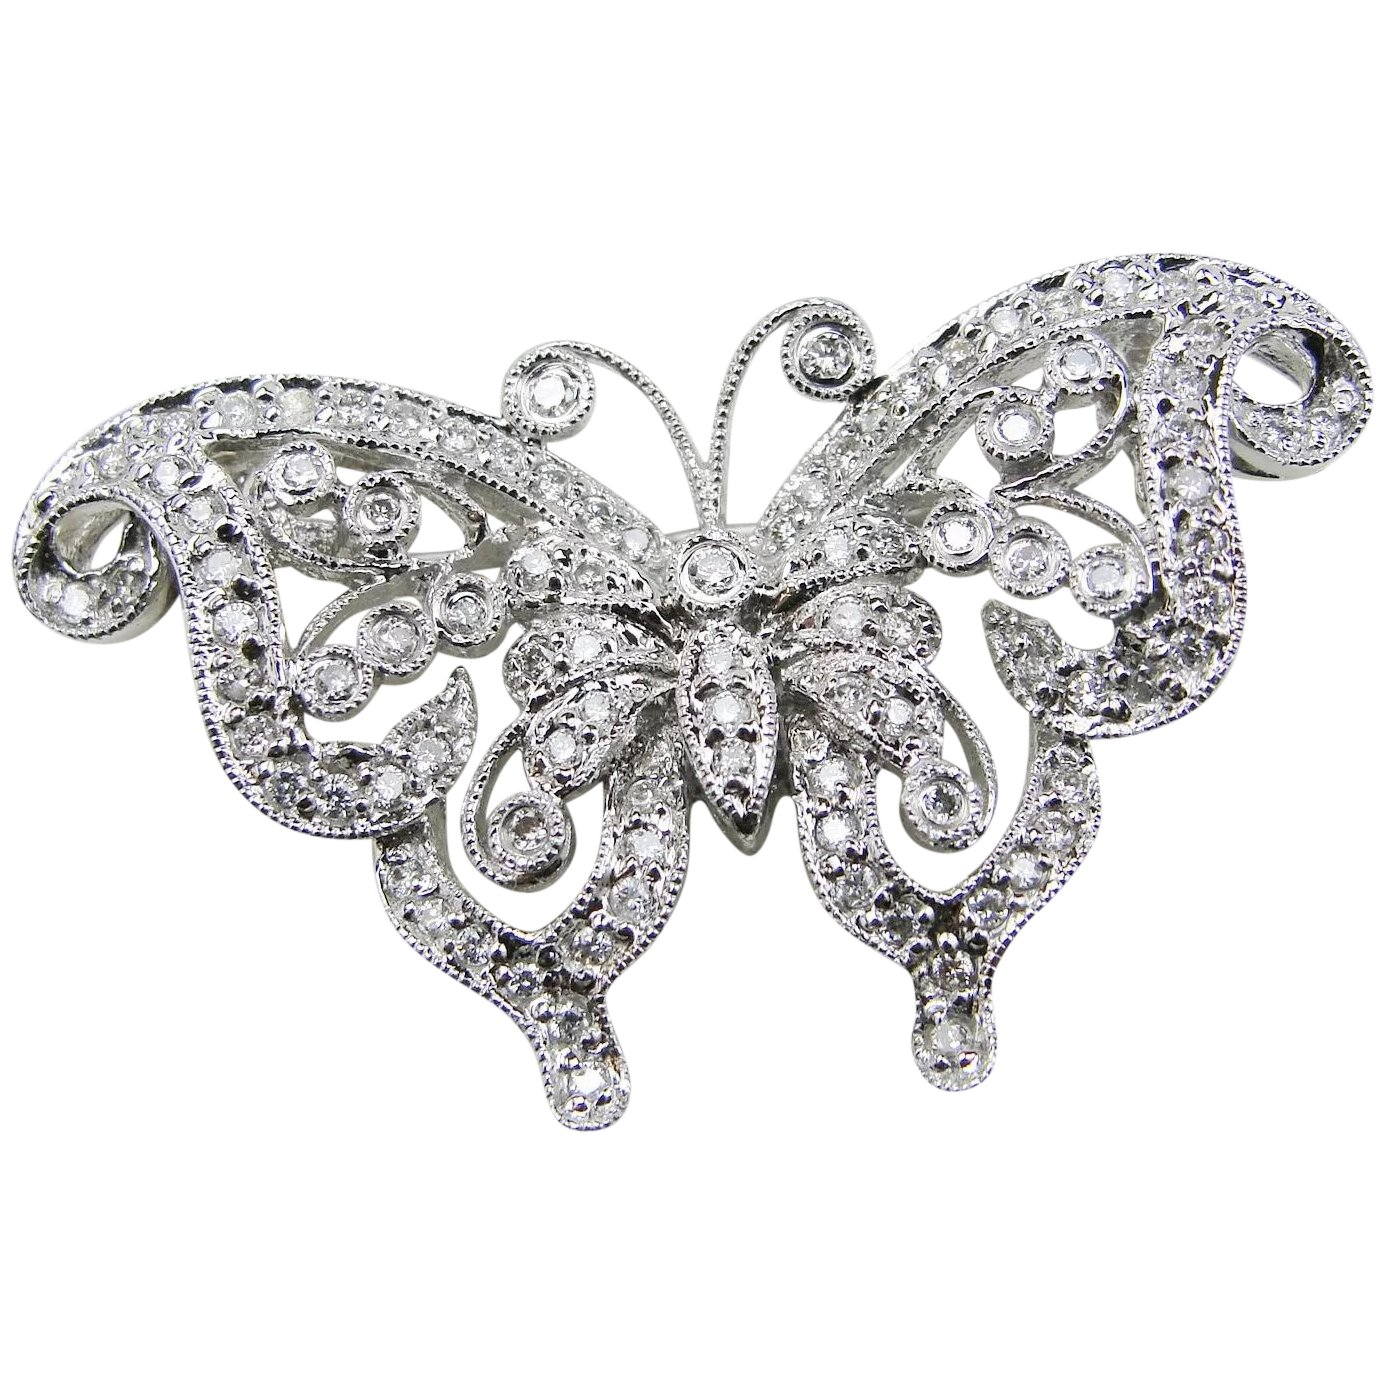 1385x1385 Vintage 14k White Gold Filigree Diamond Butterfly Pinrooch, 2ct